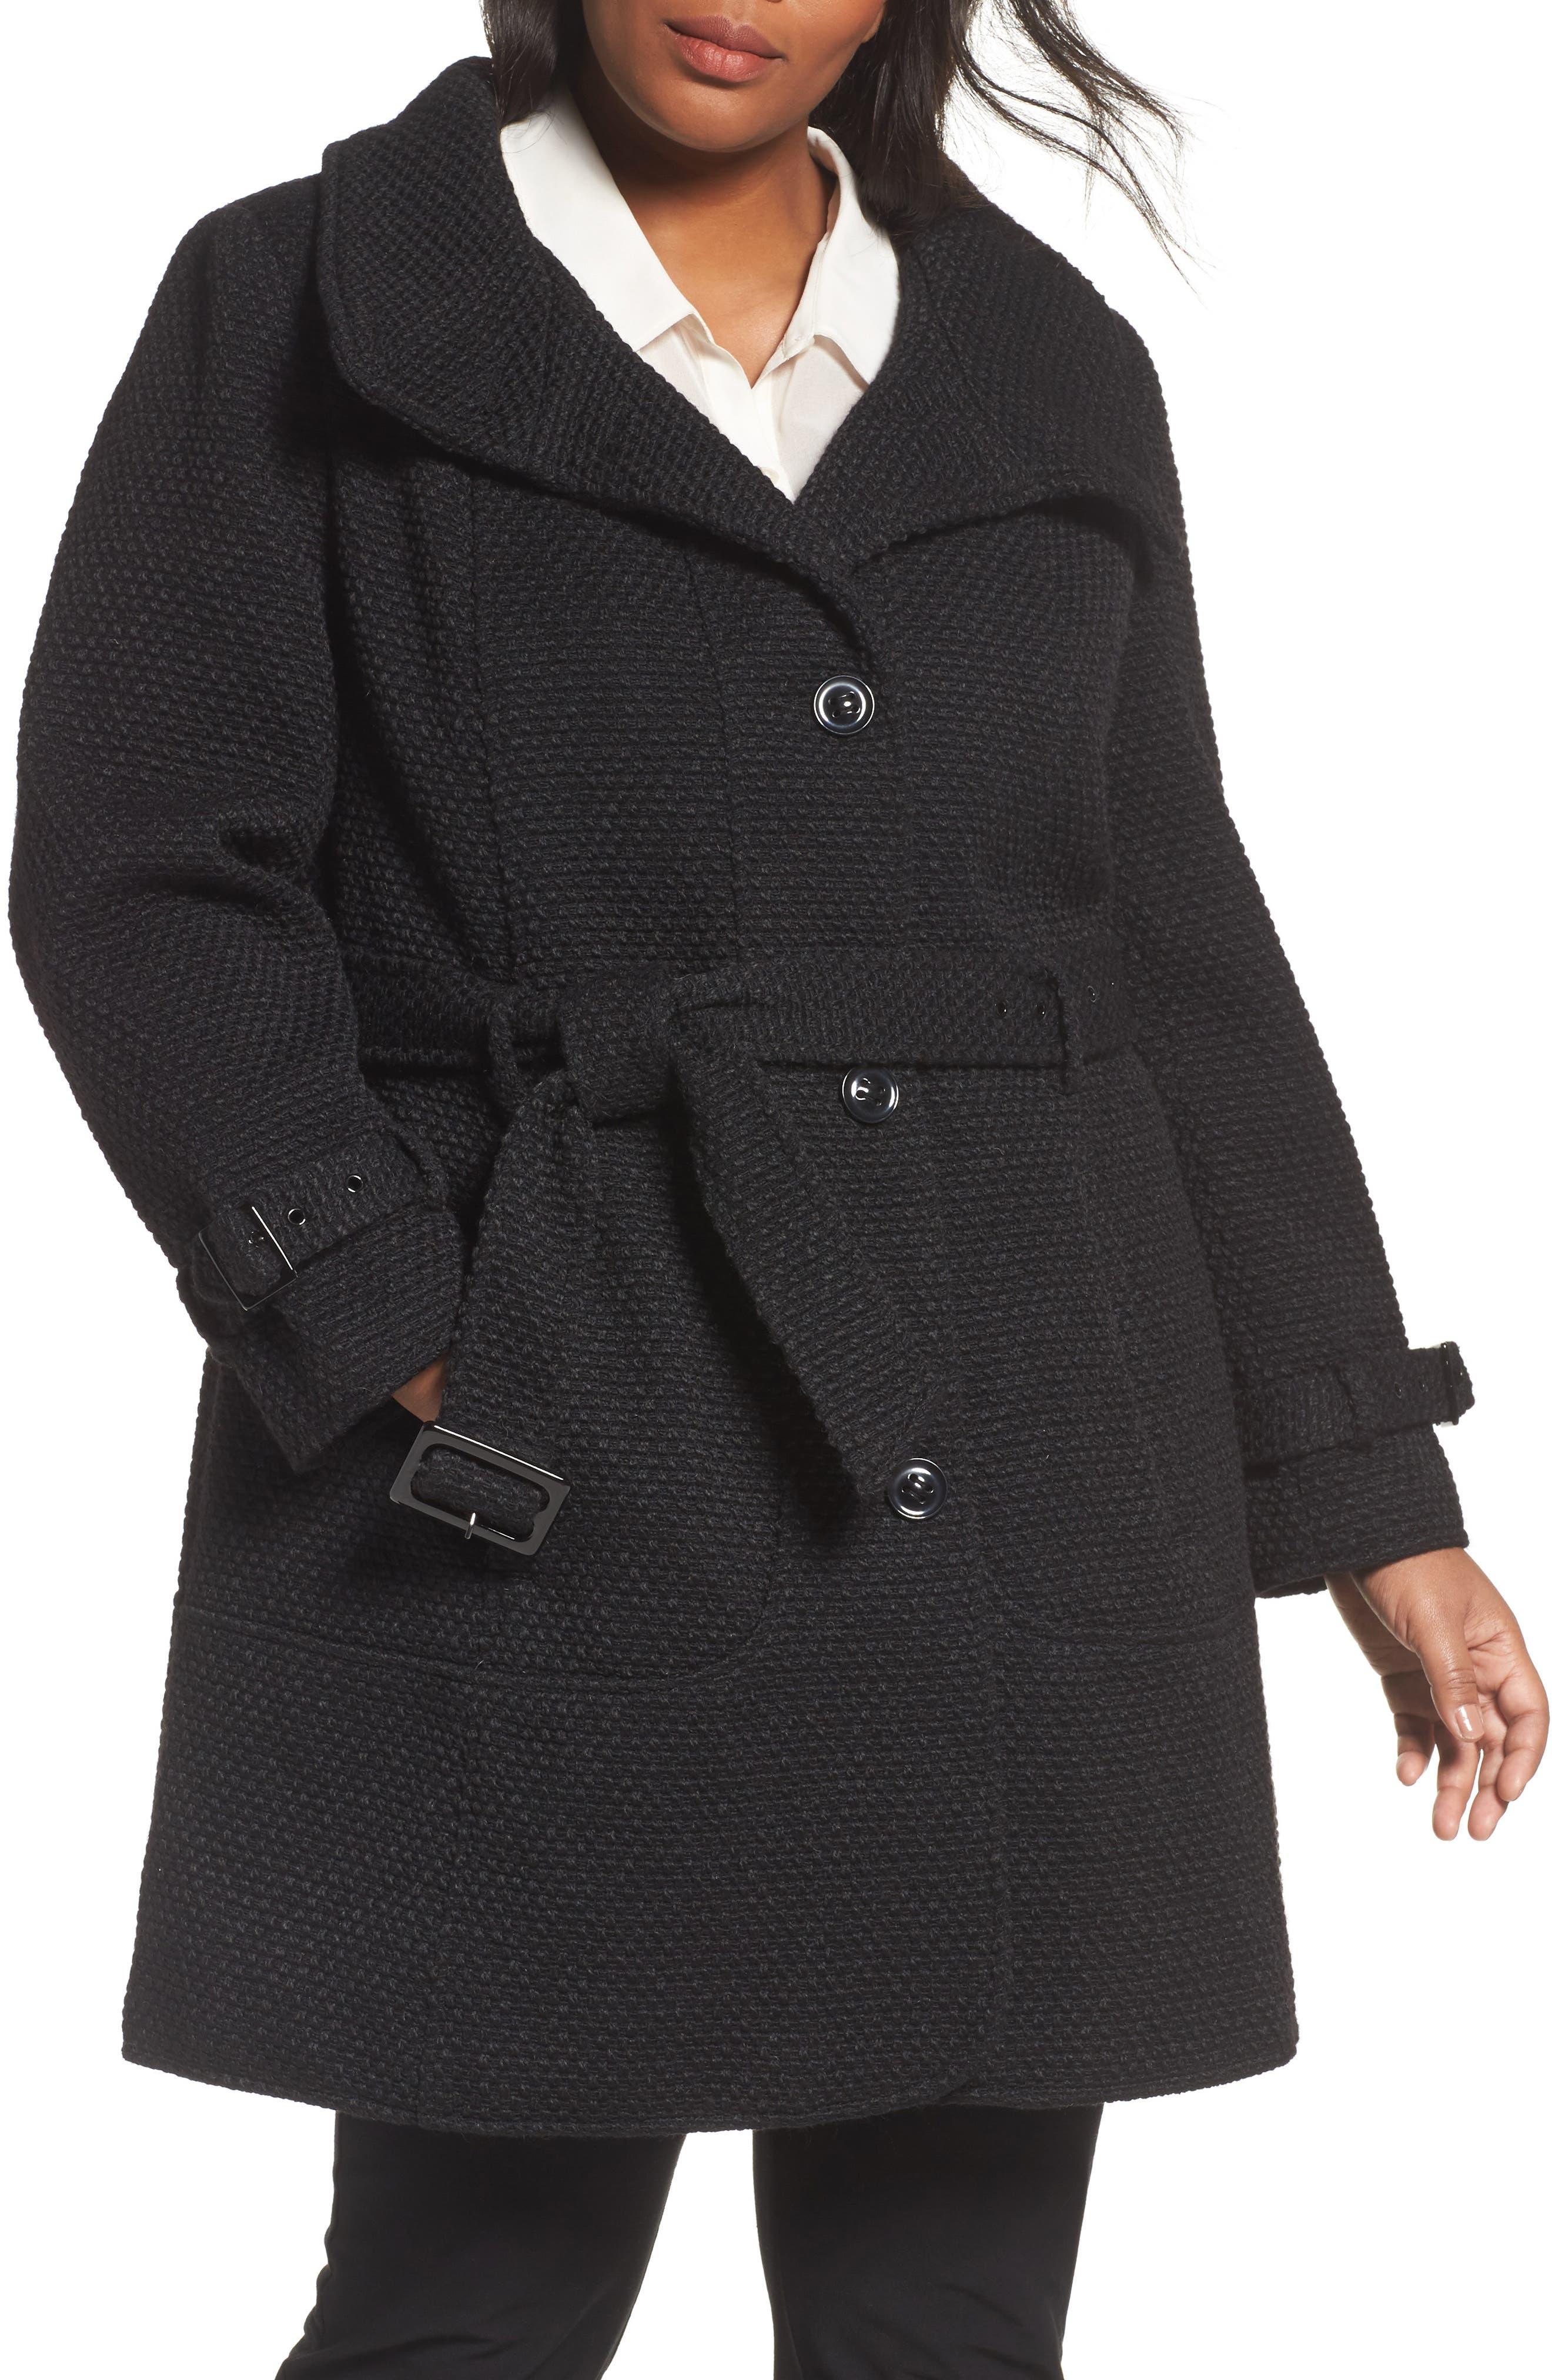 Main Image - Gallery Waffle Woven Coat (Plus Size)